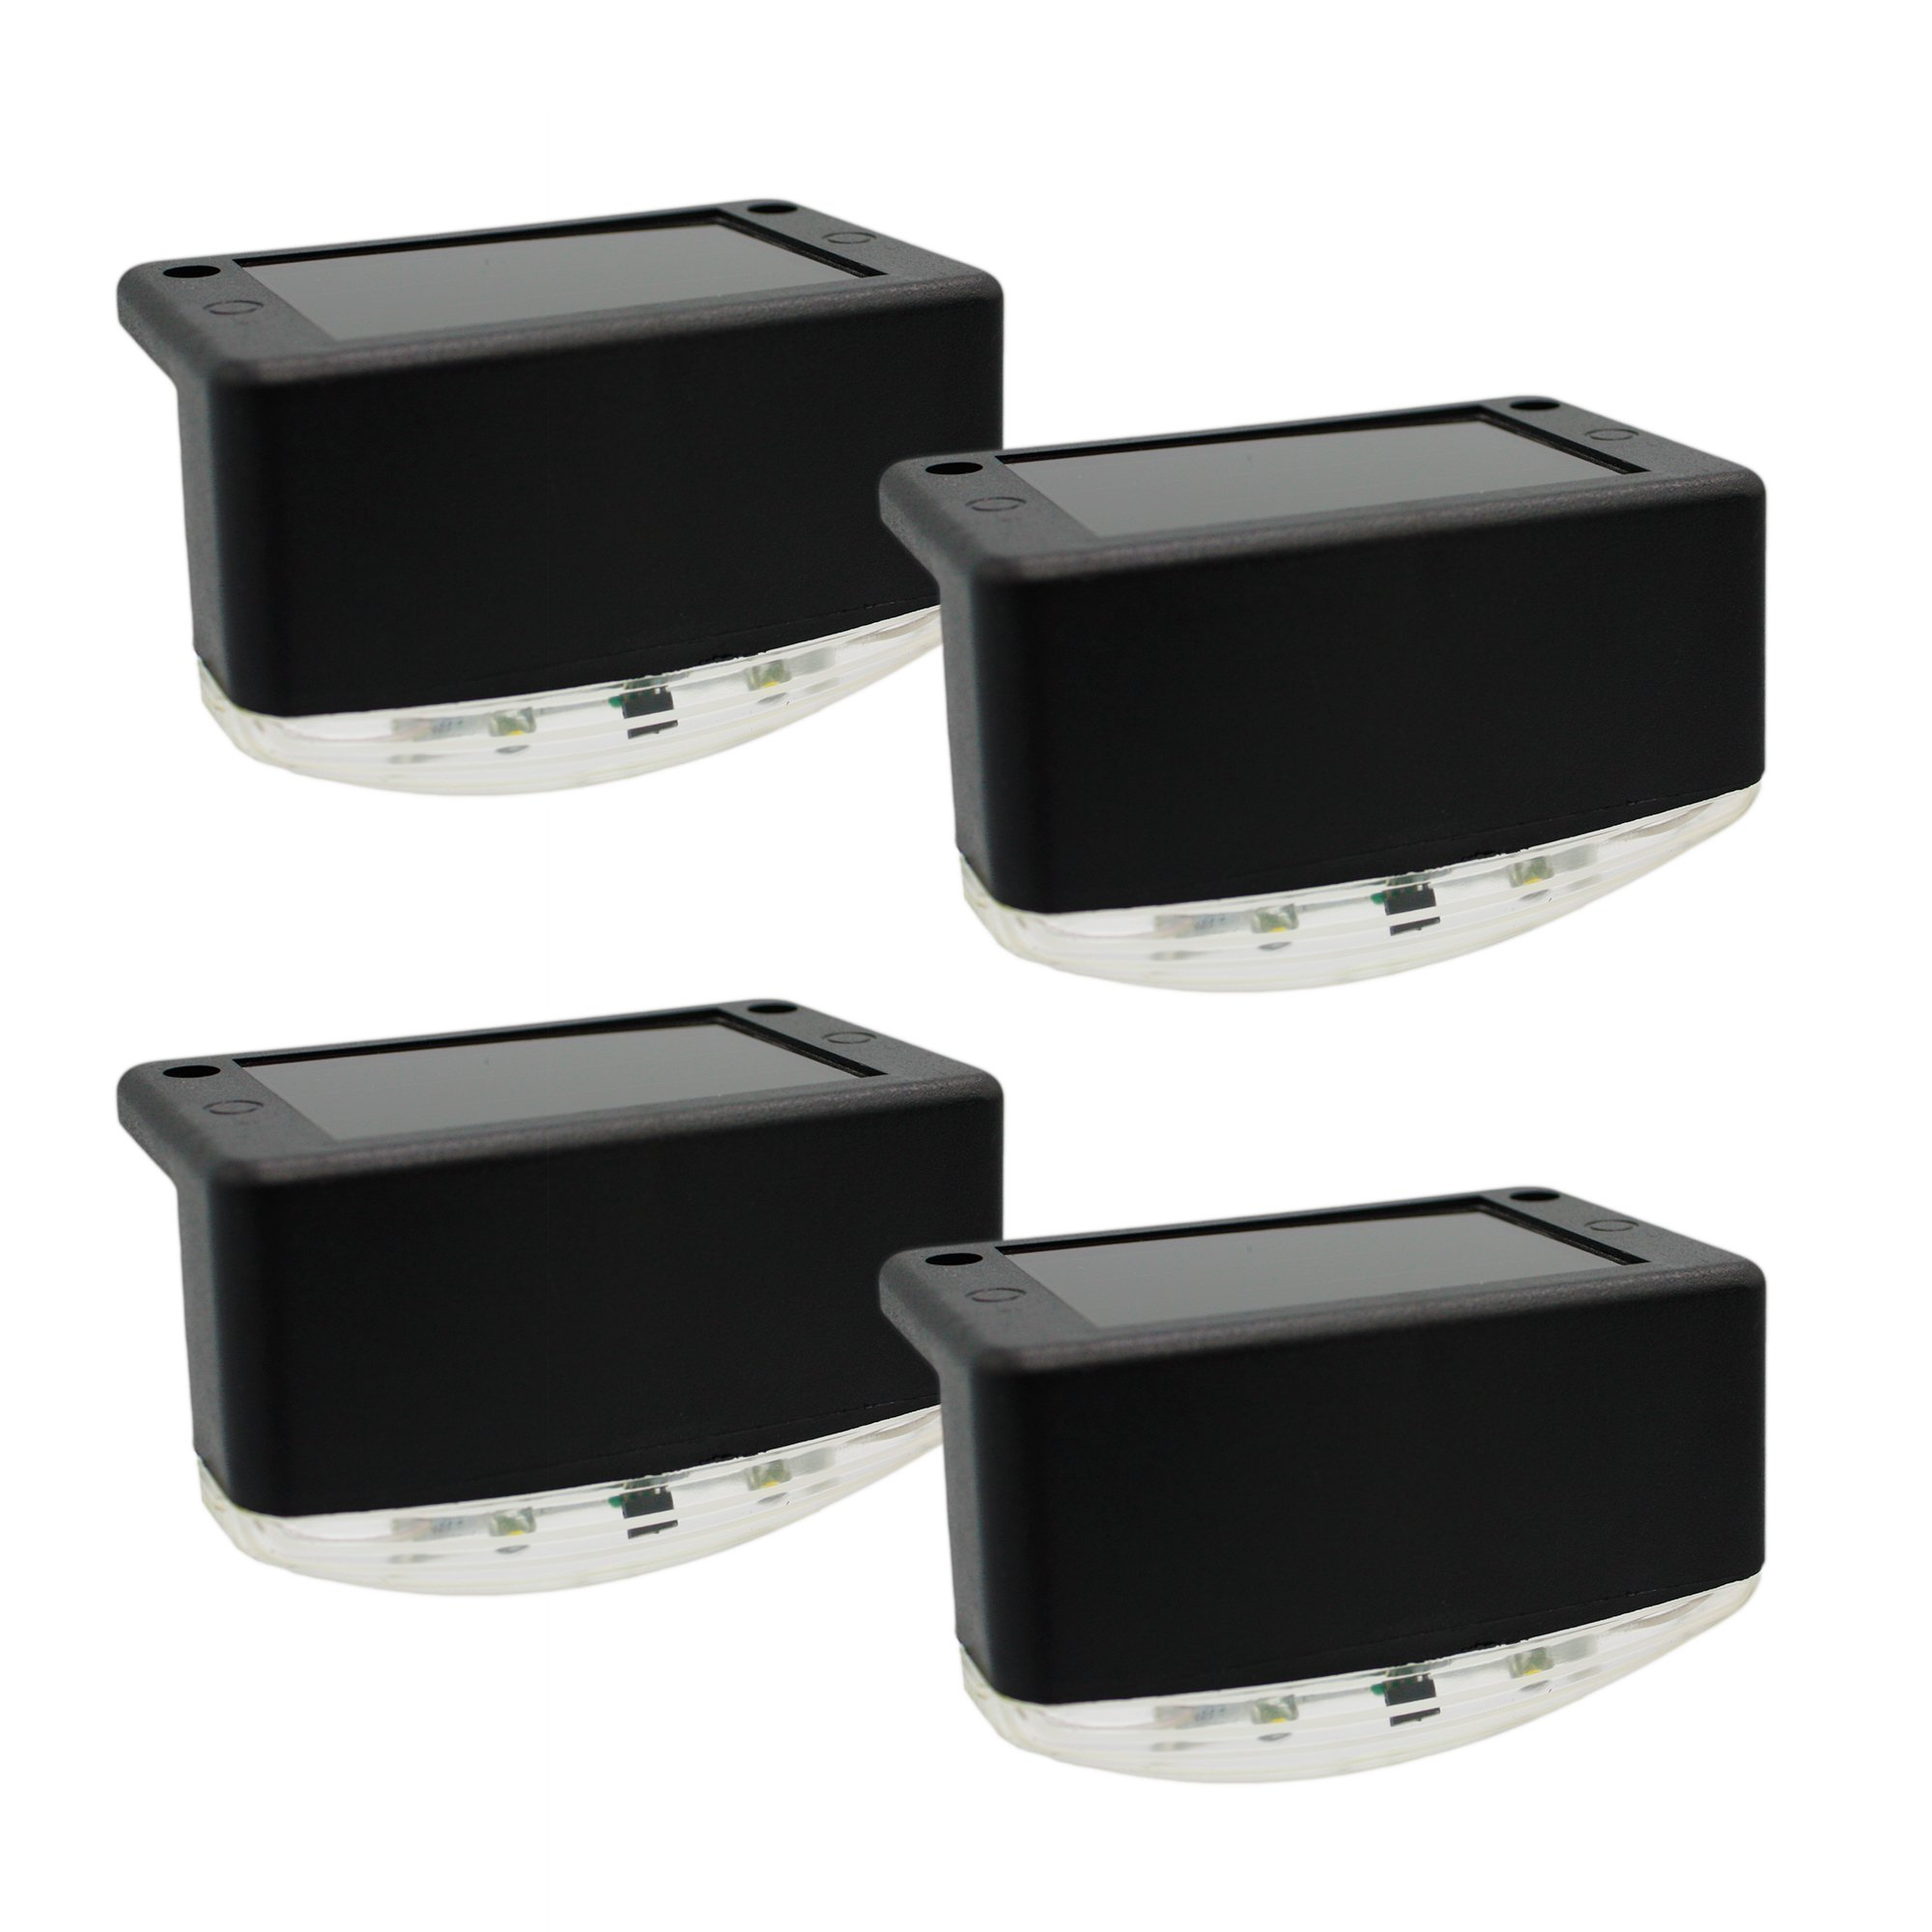 Davinci Solar Outdoor Lights - Lighting for Deck Post Fence Steps or Dock - Bright Warm White LED, Waterproof, Wireless, Slate Black (4 Pack) by Davinci Lighting